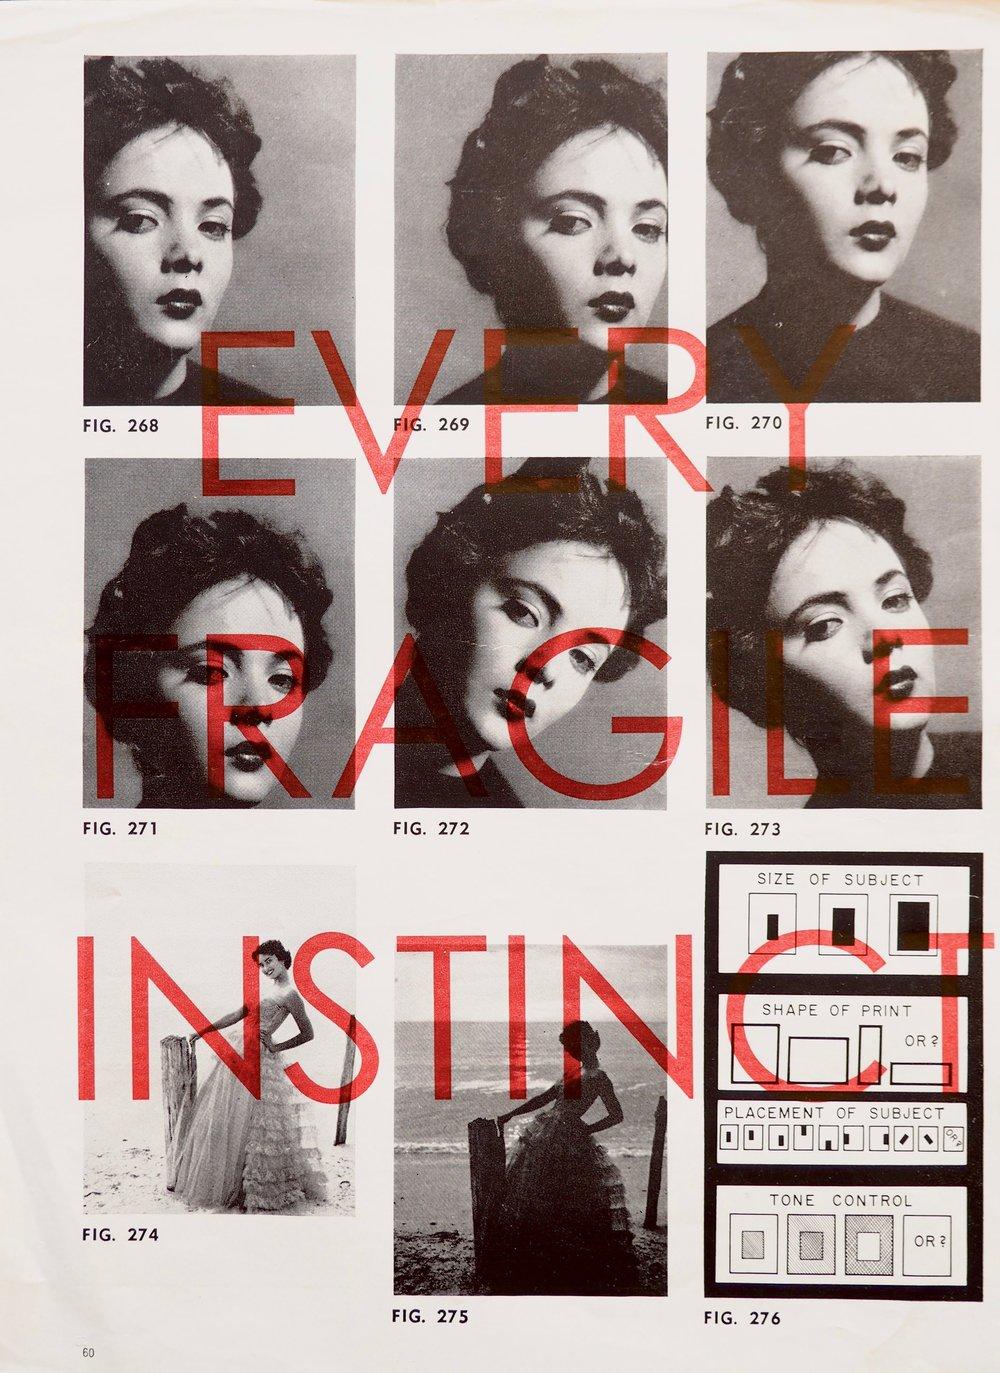 Every Fragile Instinct